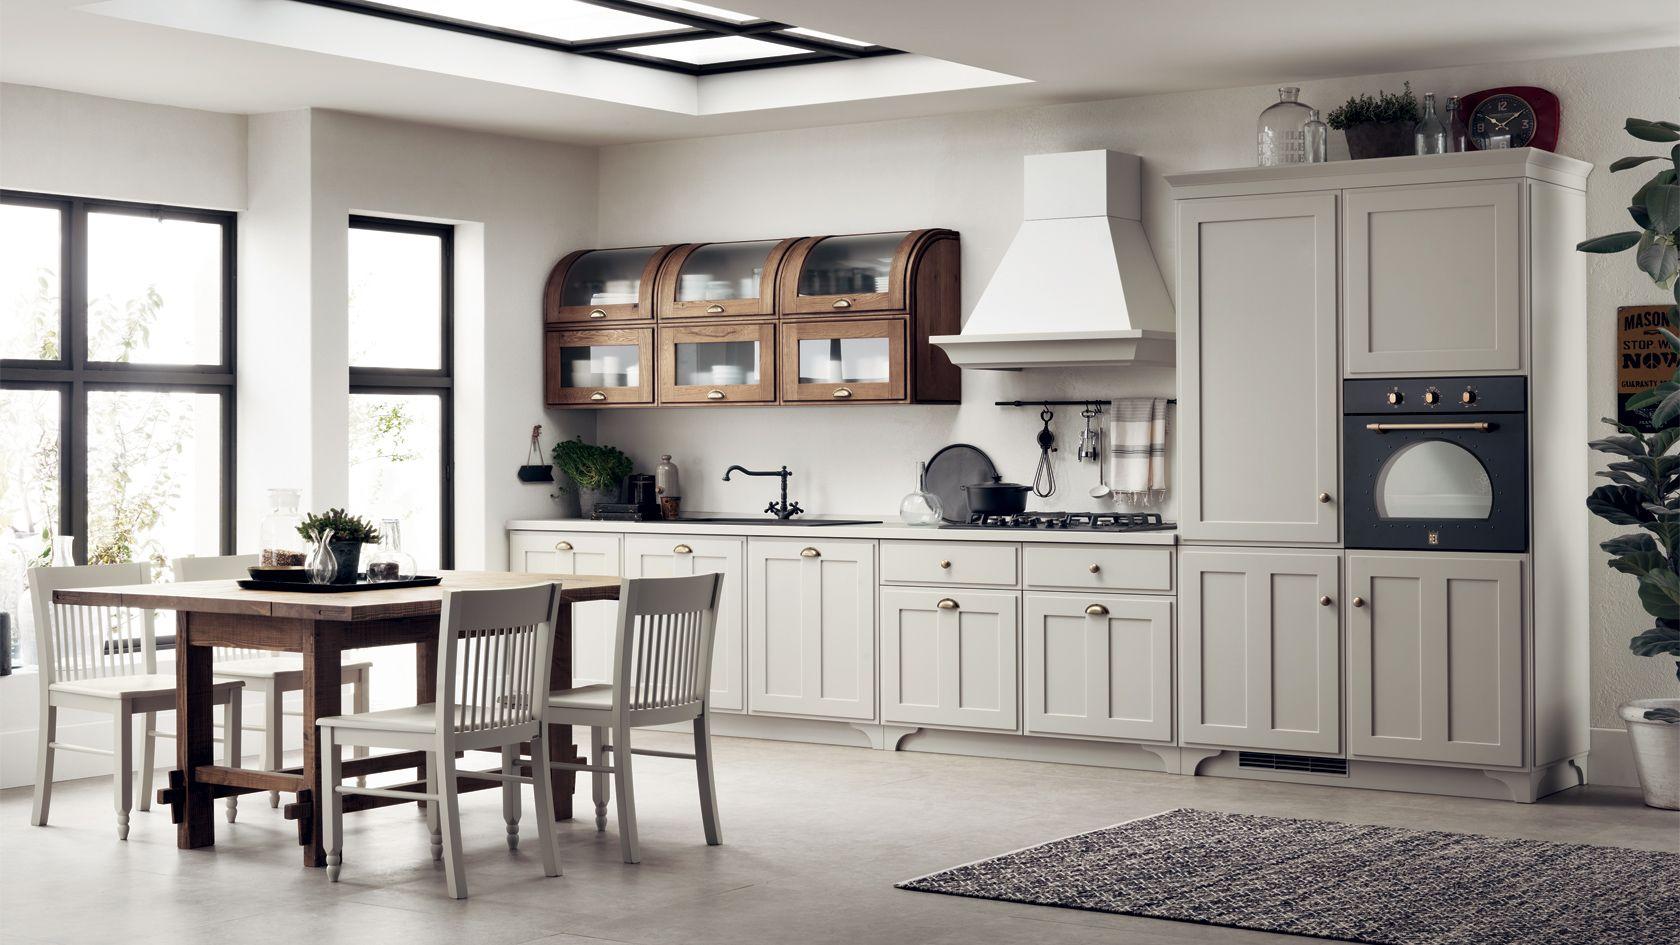 Scavolini Favilla | Cuisines-Kitchen | Pinterest | Curved walls ...